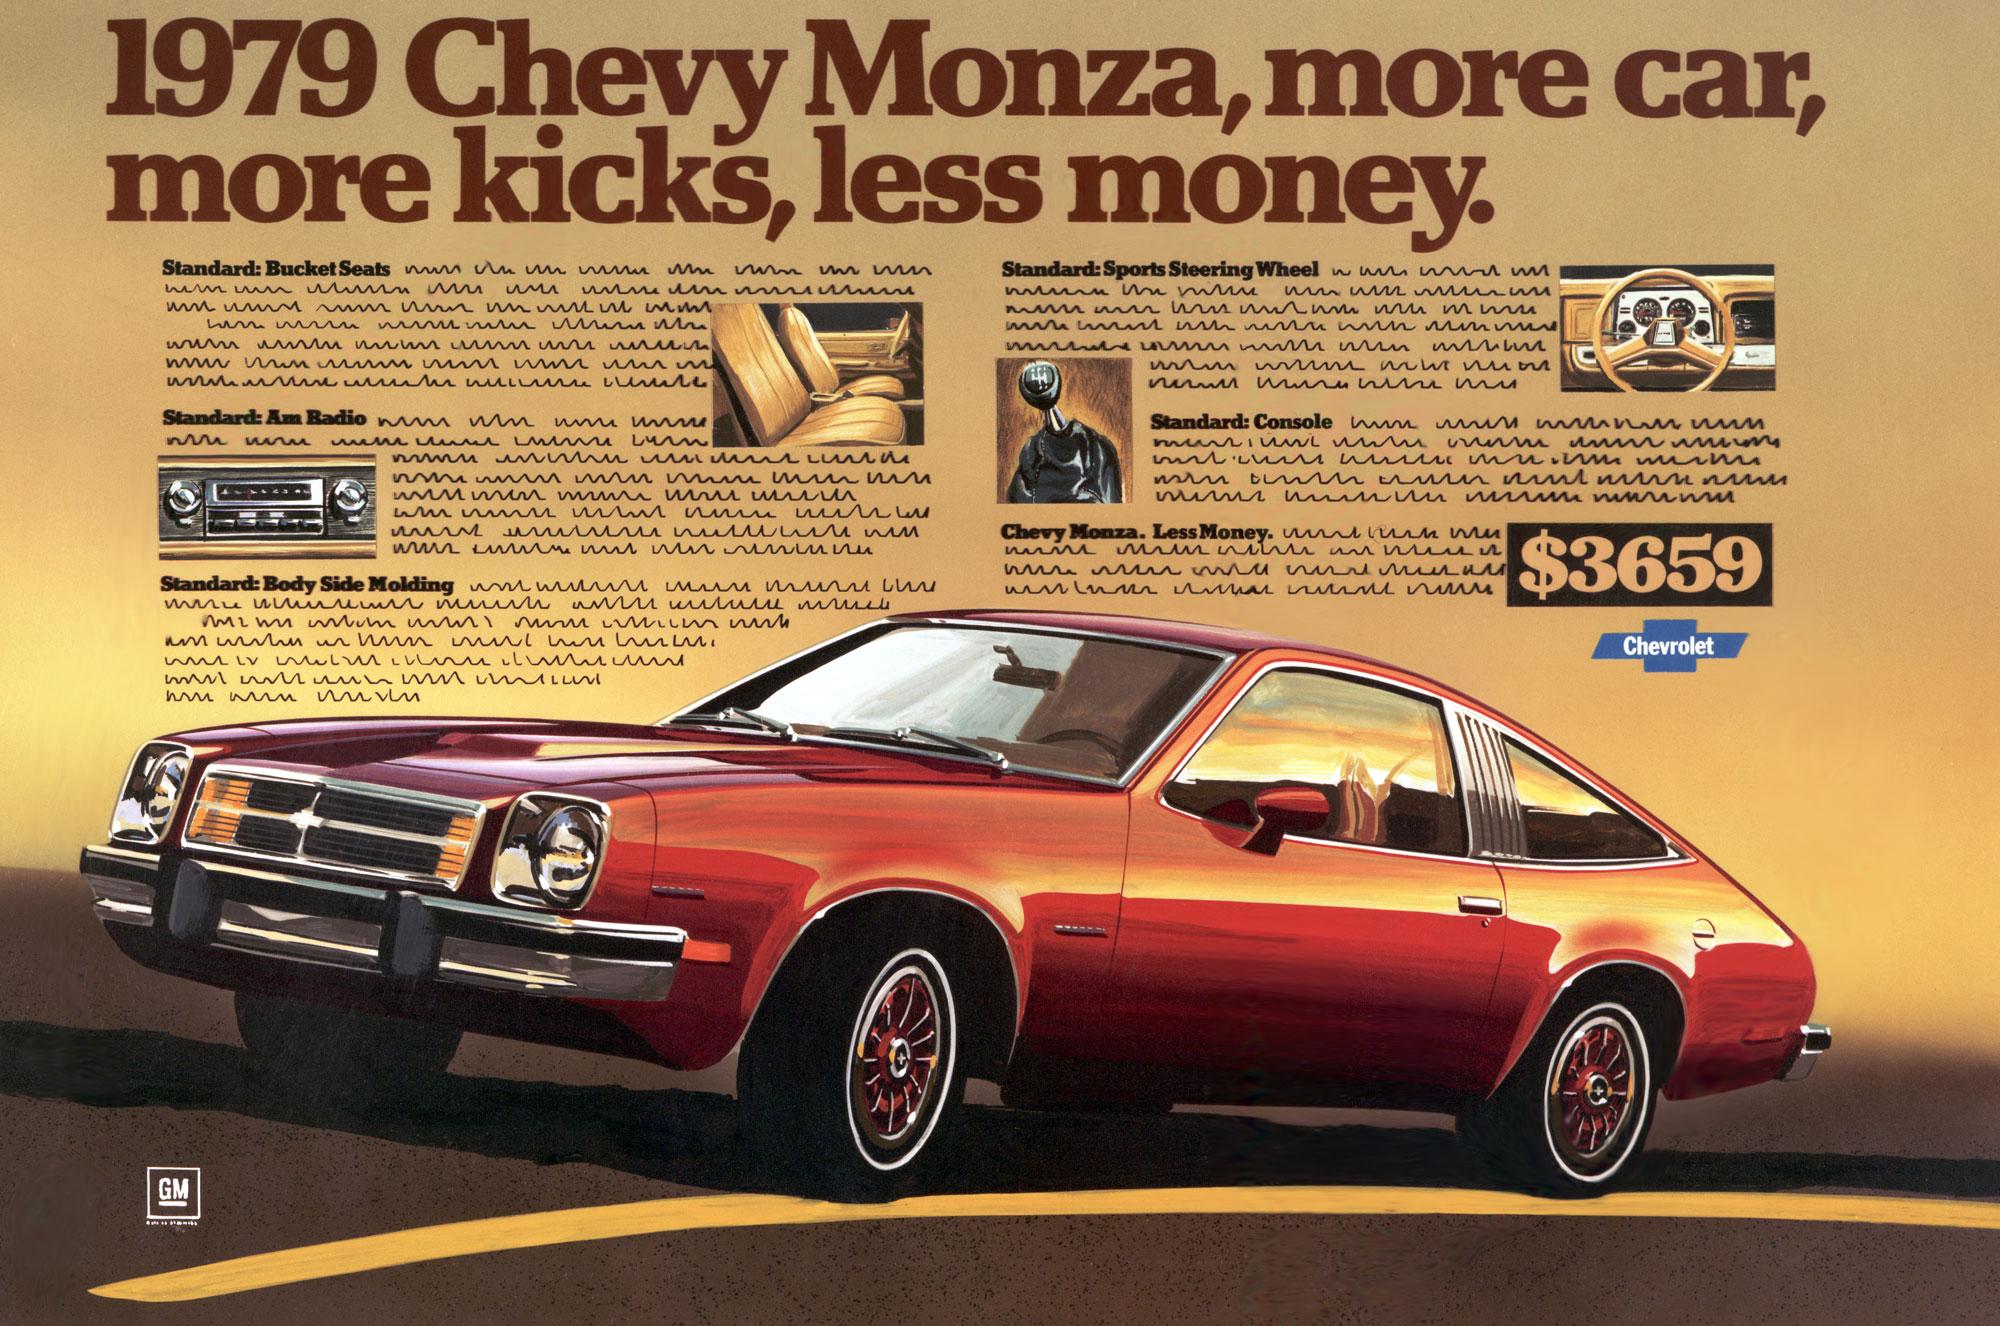 Chevrolet Monza print advertisement